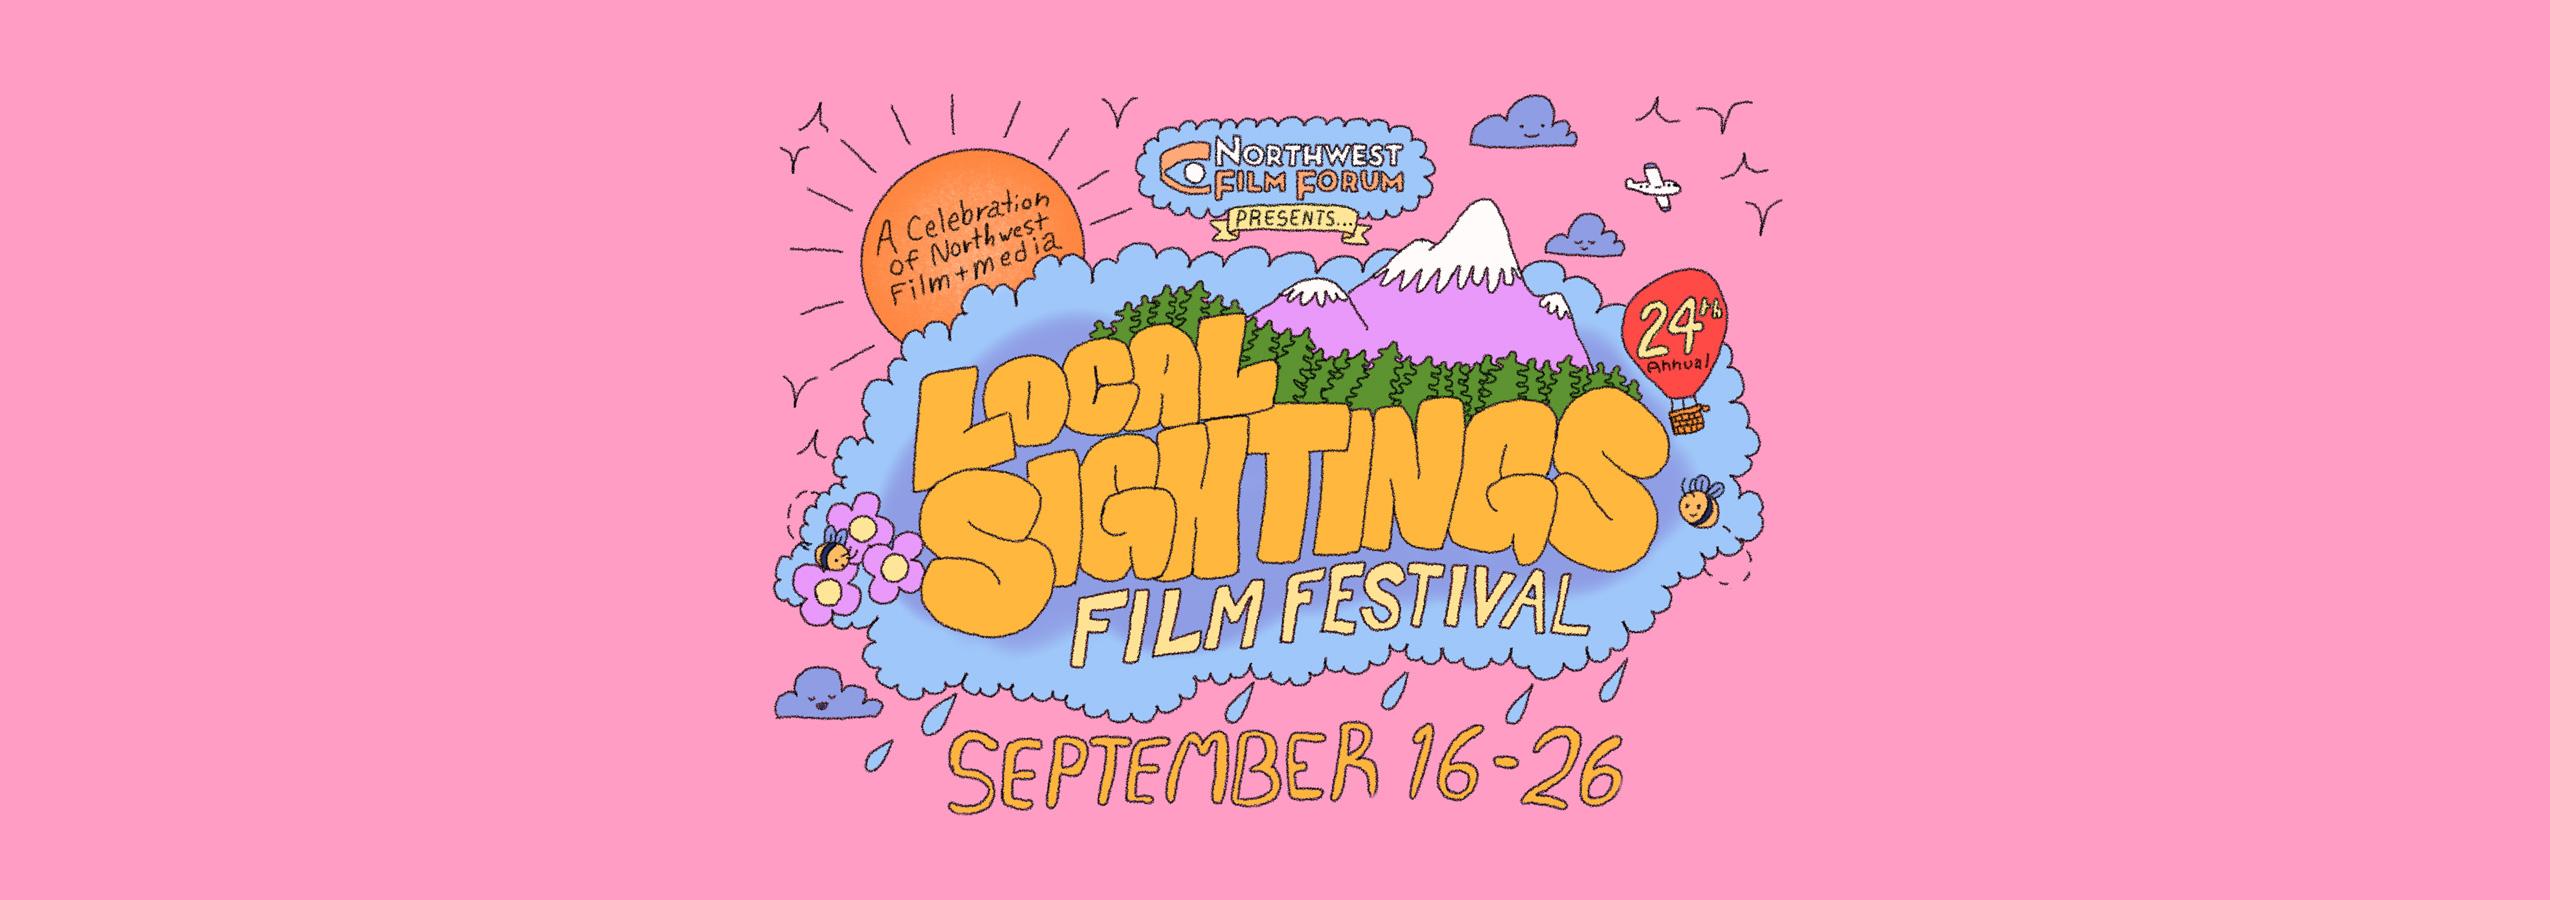 Local Sightings Film Festival 2021